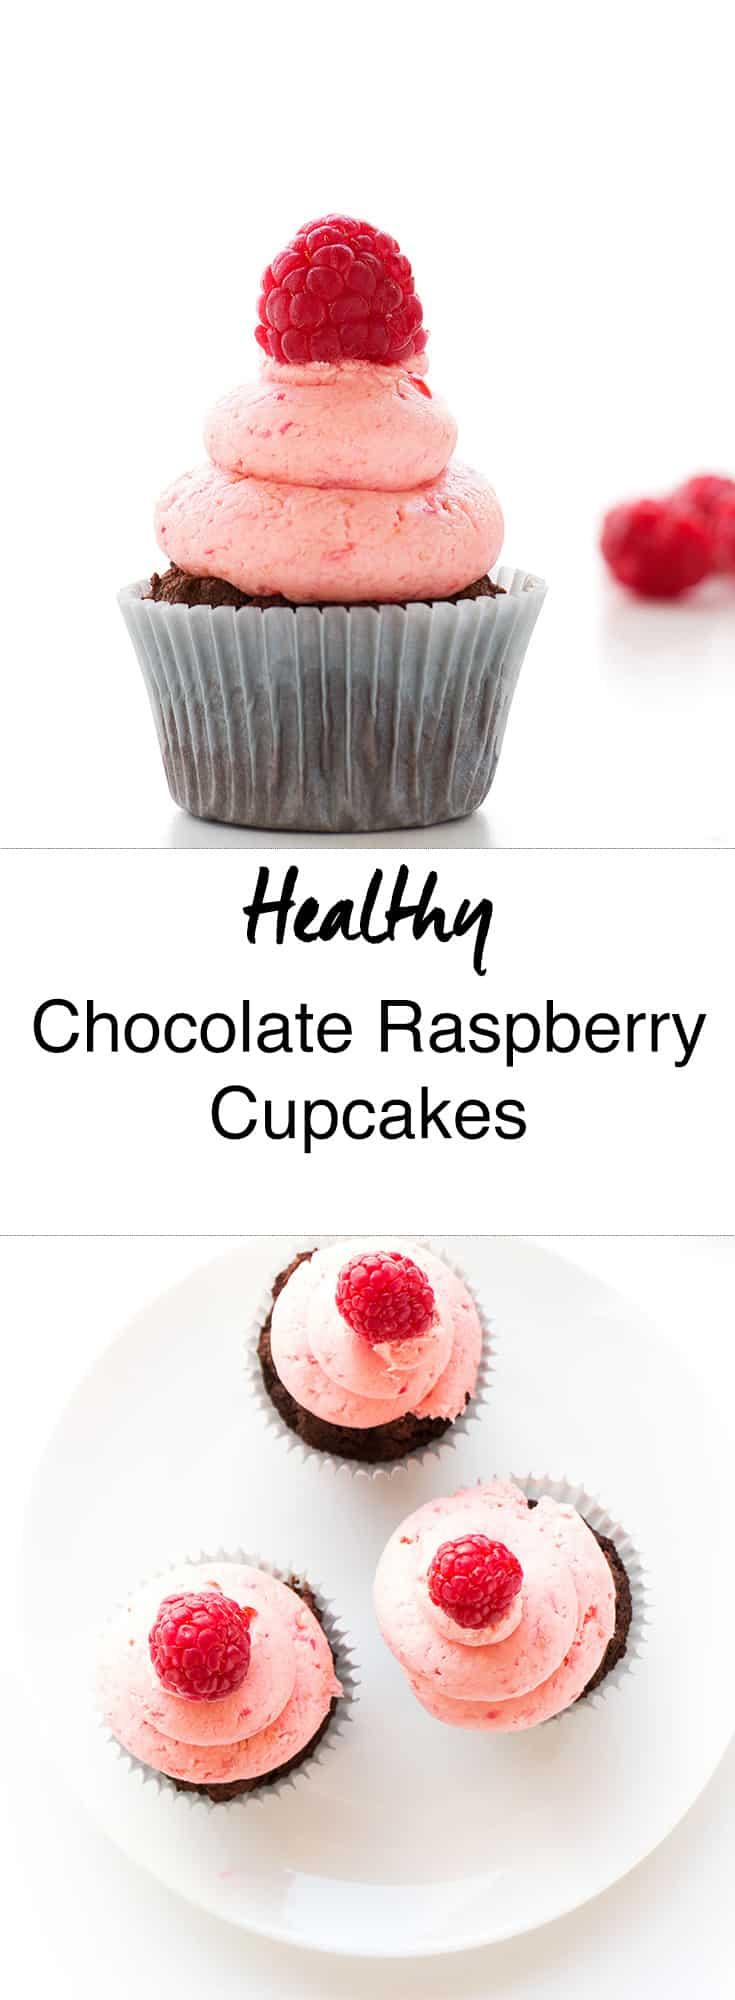 Healthy Chocolate Raspberry Cupcakes